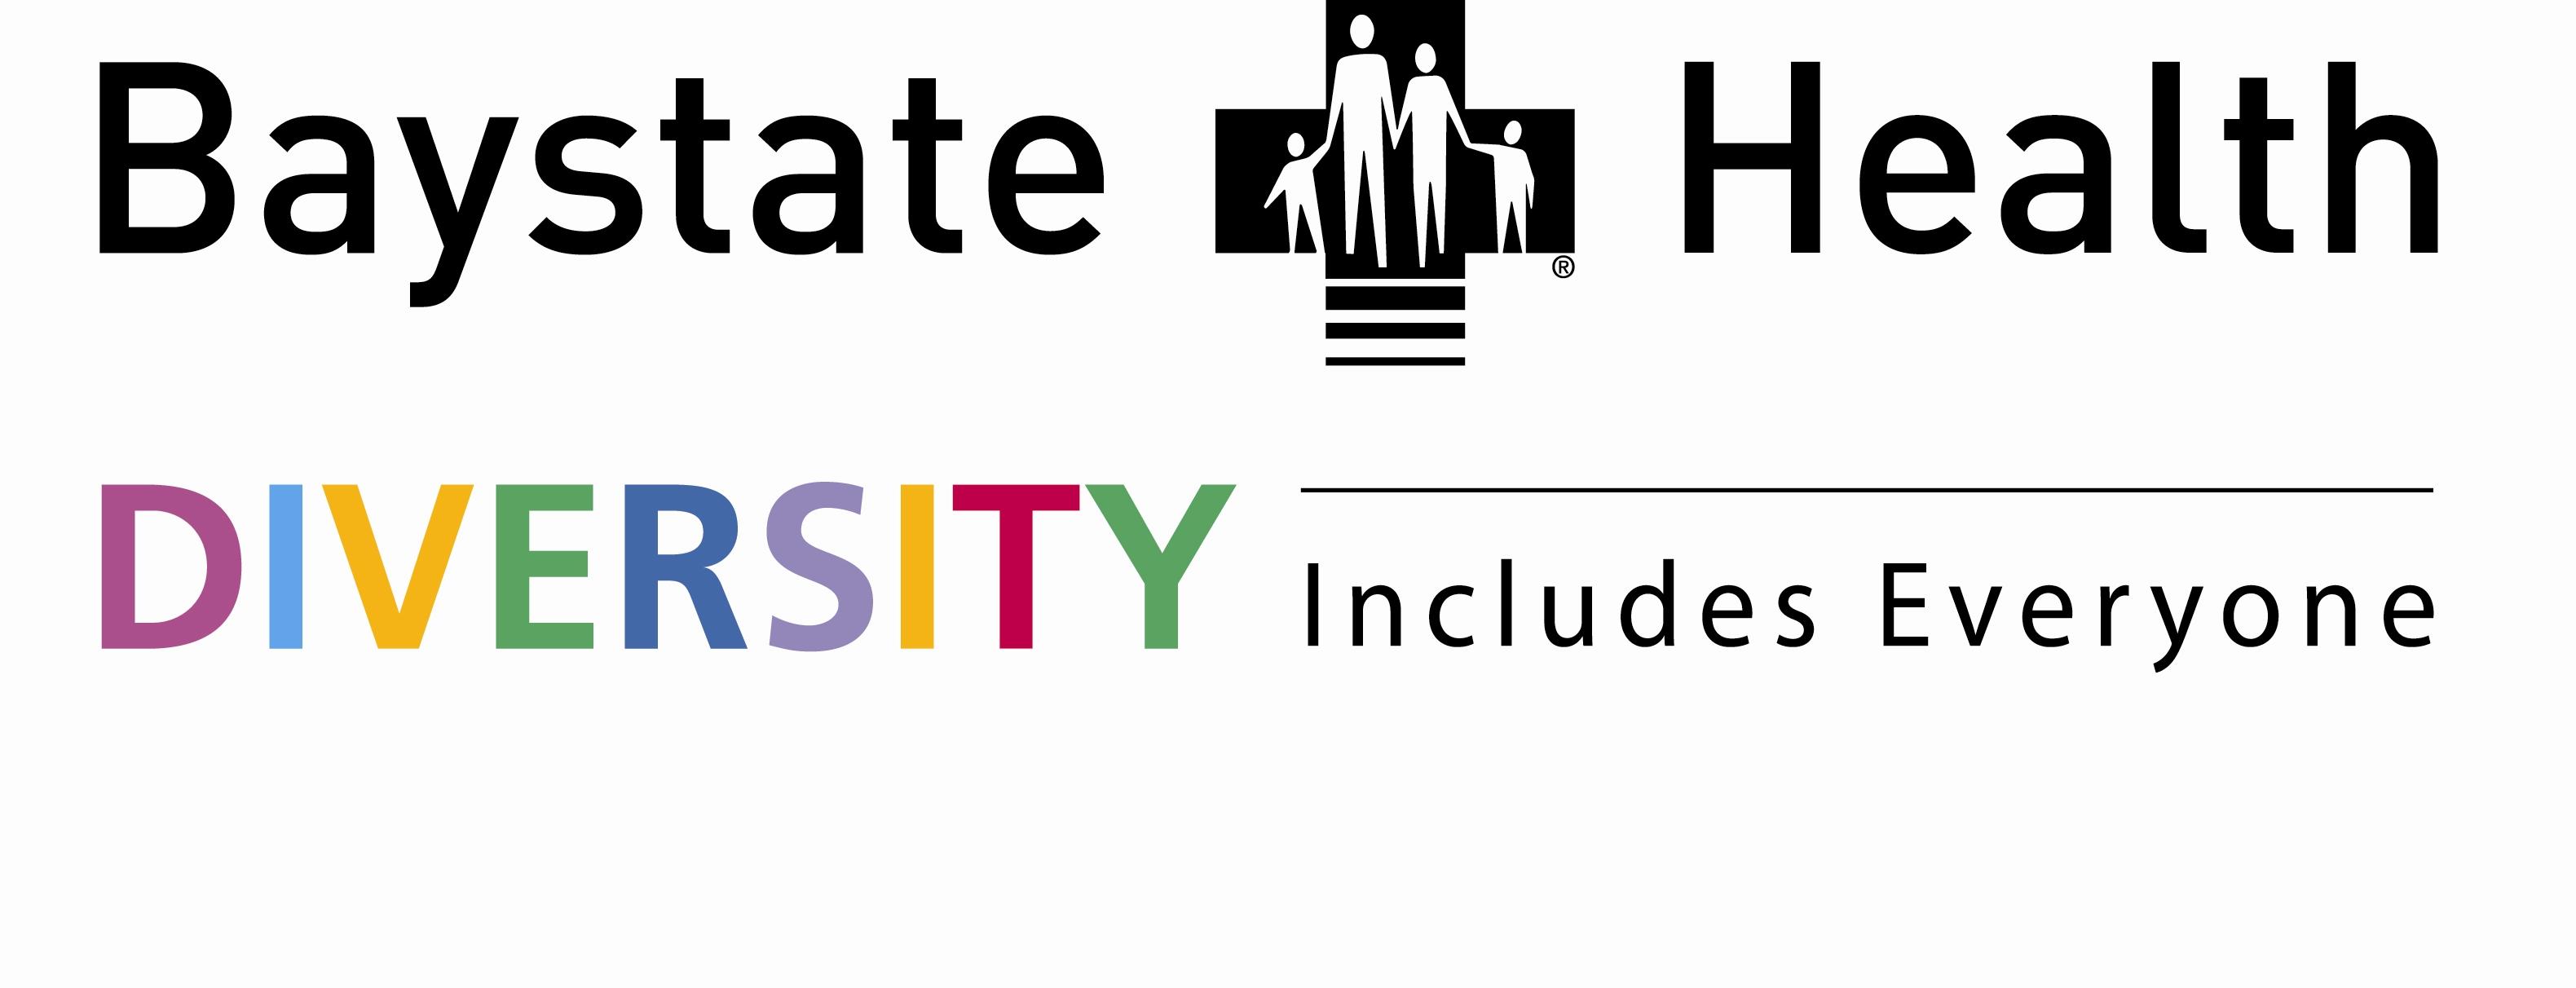 BH 1 line Diversity - external use approved.JPG